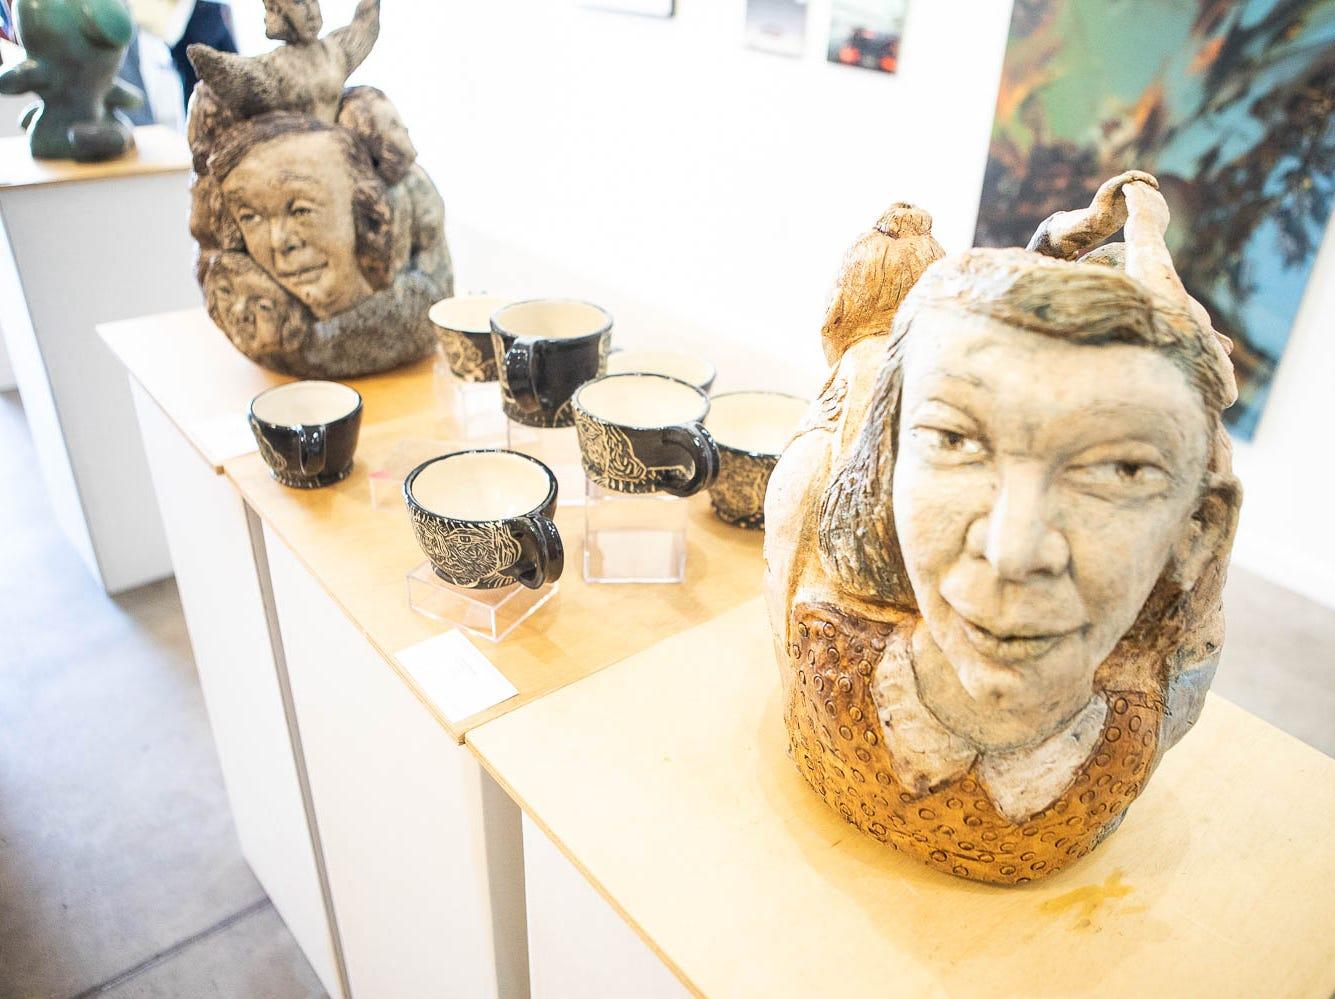 Deborah Hodder sculptures were on display on March 16, 2019, in Phoenix during Art Detour.